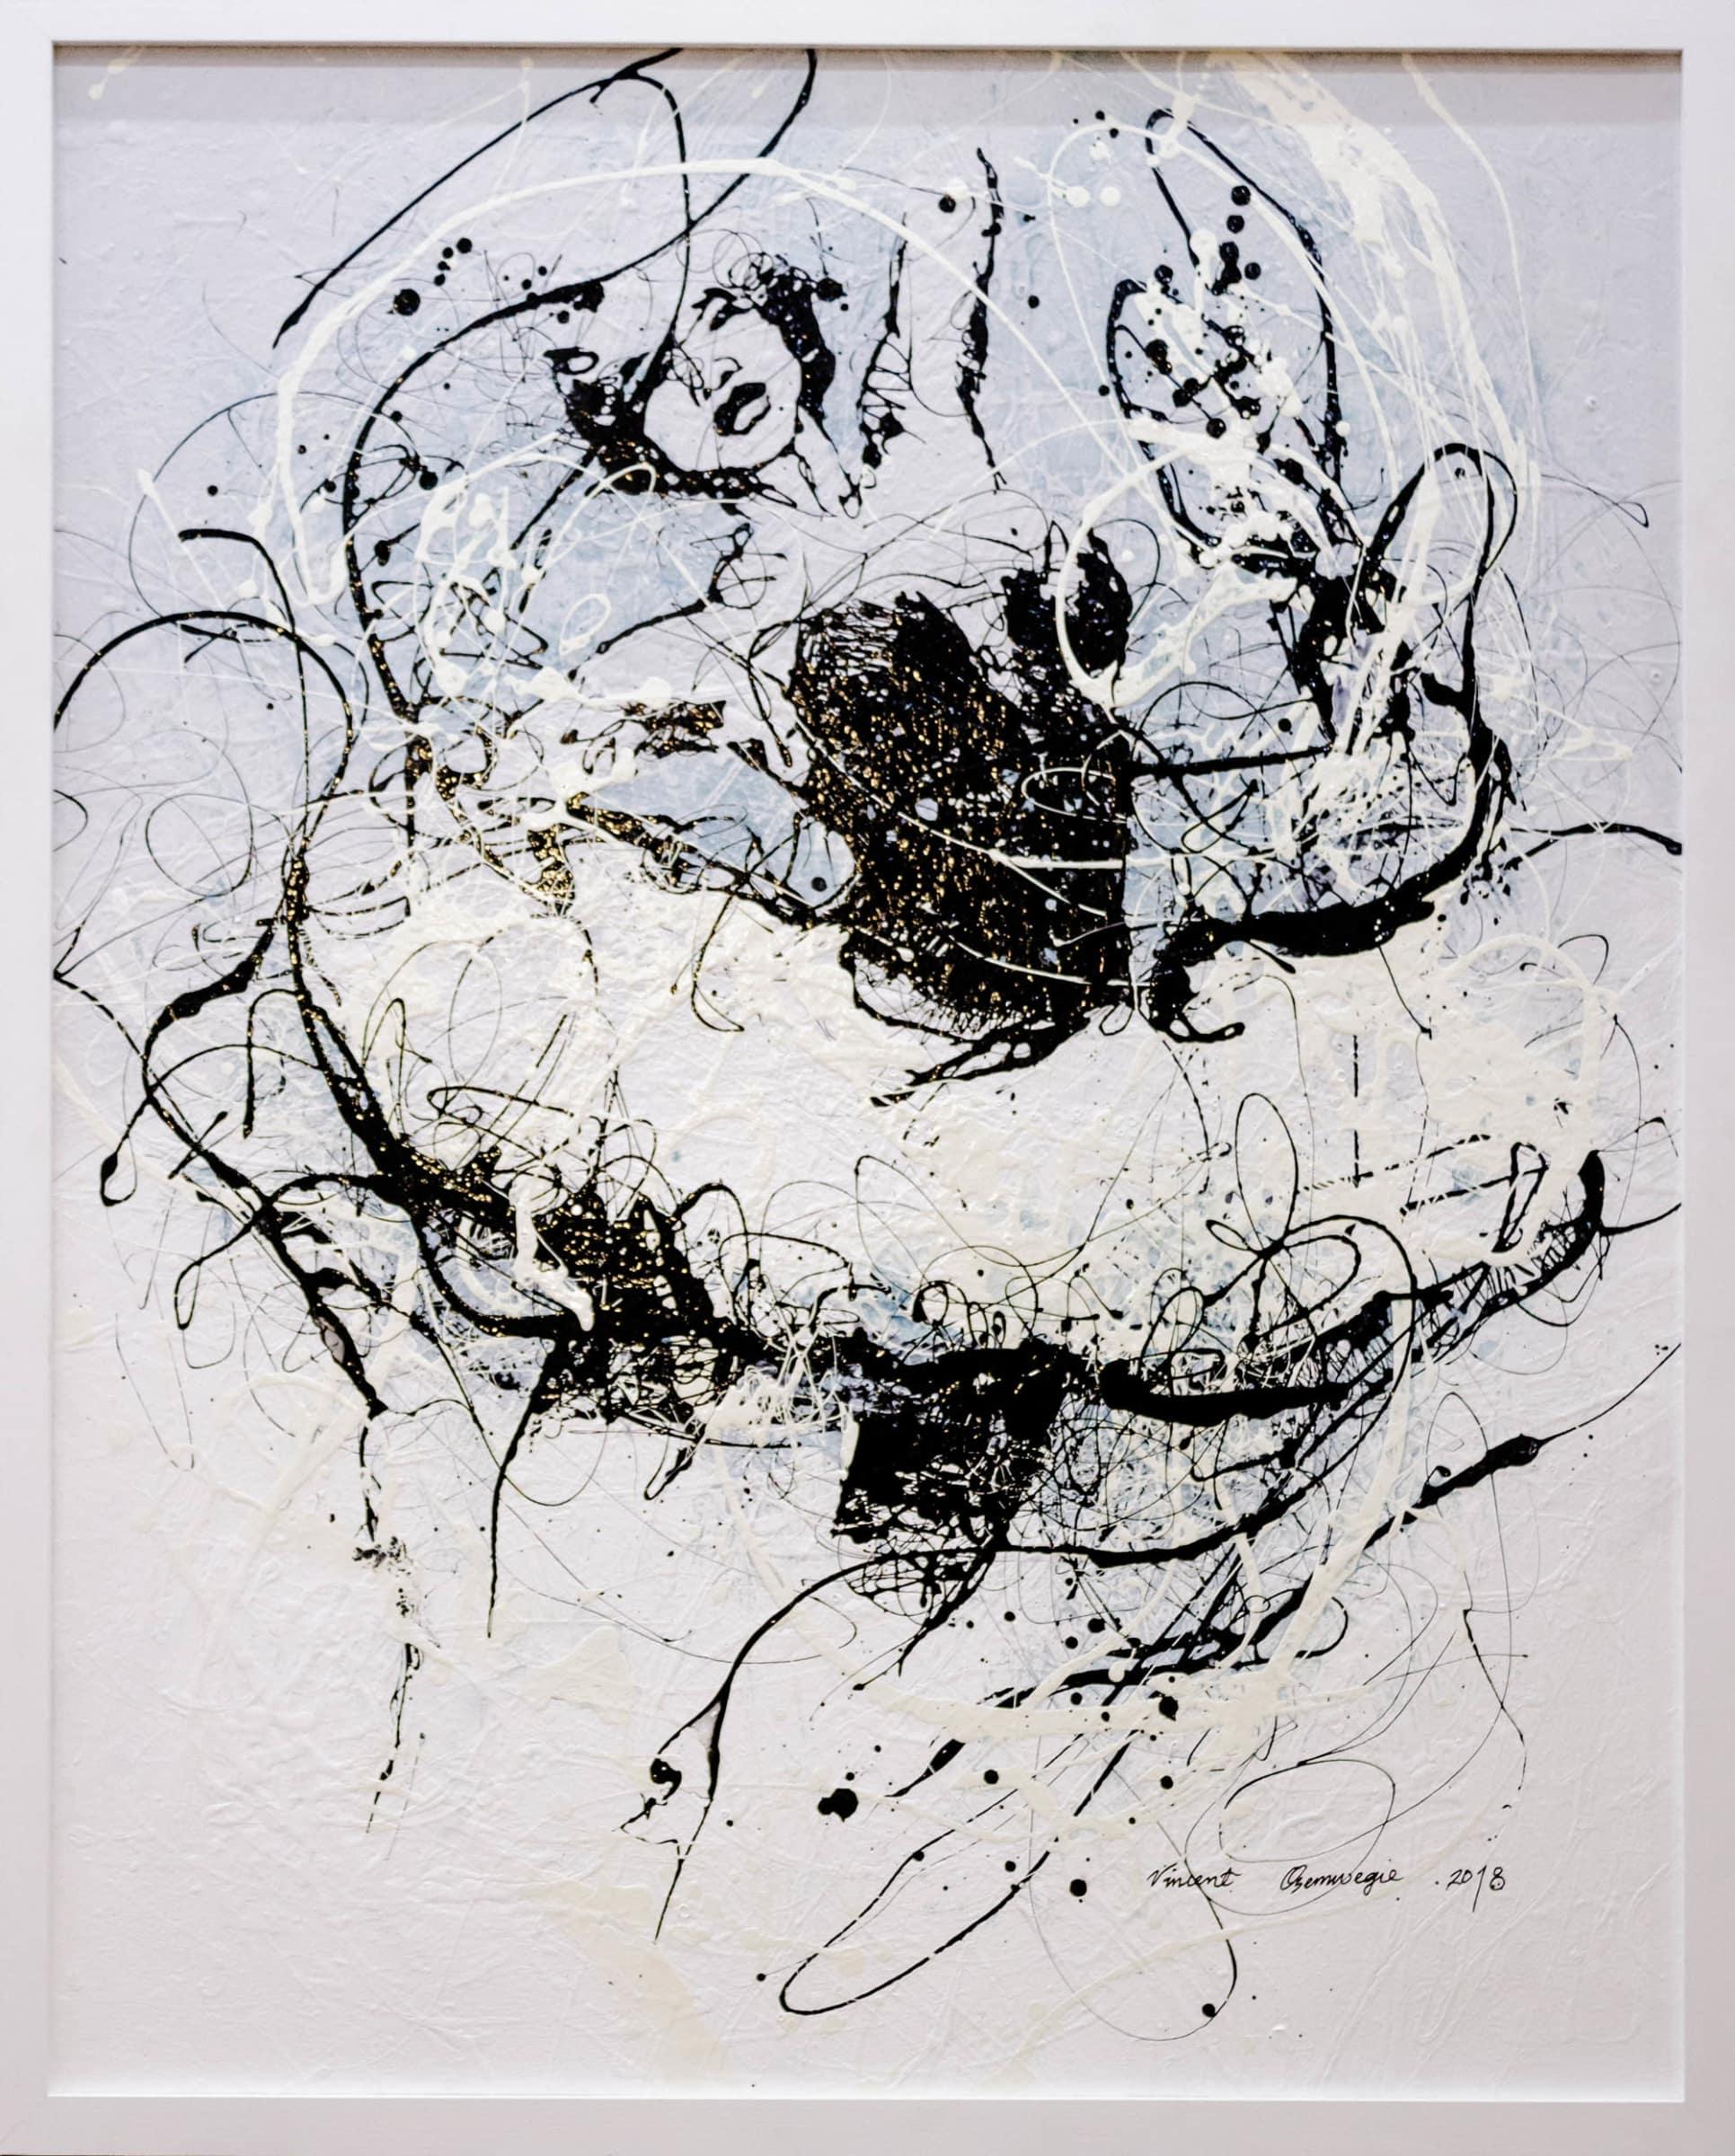 <span class=&#34;link fancybox-details-link&#34;><a href=&#34;/artworks/3071-vincent-osemwegie-emotion-x-2018/&#34;>View Detail Page</a></span><div class=&#34;artist&#34;><strong>Vincent Osemwegie</strong></div> <div class=&#34;title&#34;><em>Emotion X</em>, 2018</div> <div class=&#34;medium&#34;>Mixed Media On Canvas </div> <div class=&#34;dimensions&#34;>150cm x 120cm</div><div class=&#34;price&#34;>R29,500.00</div>